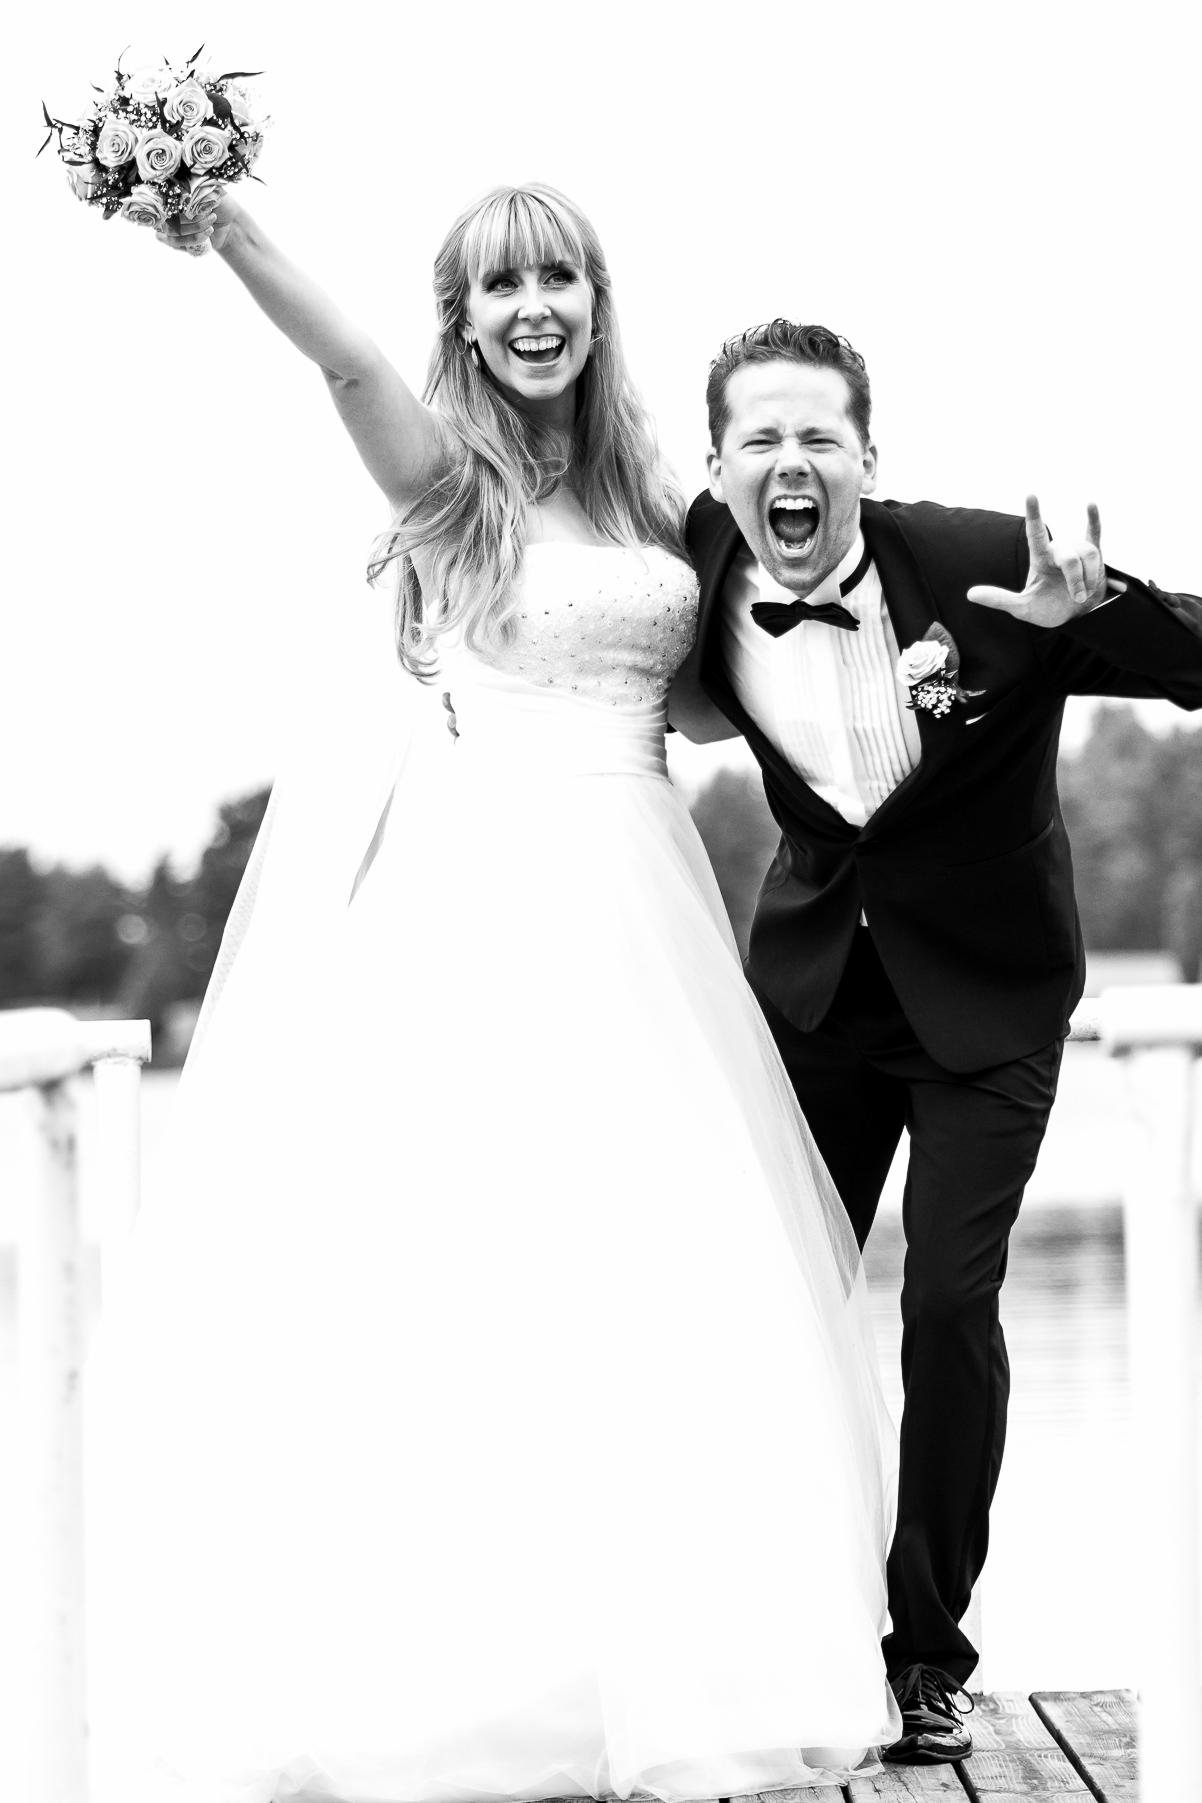 Bröllopstider!